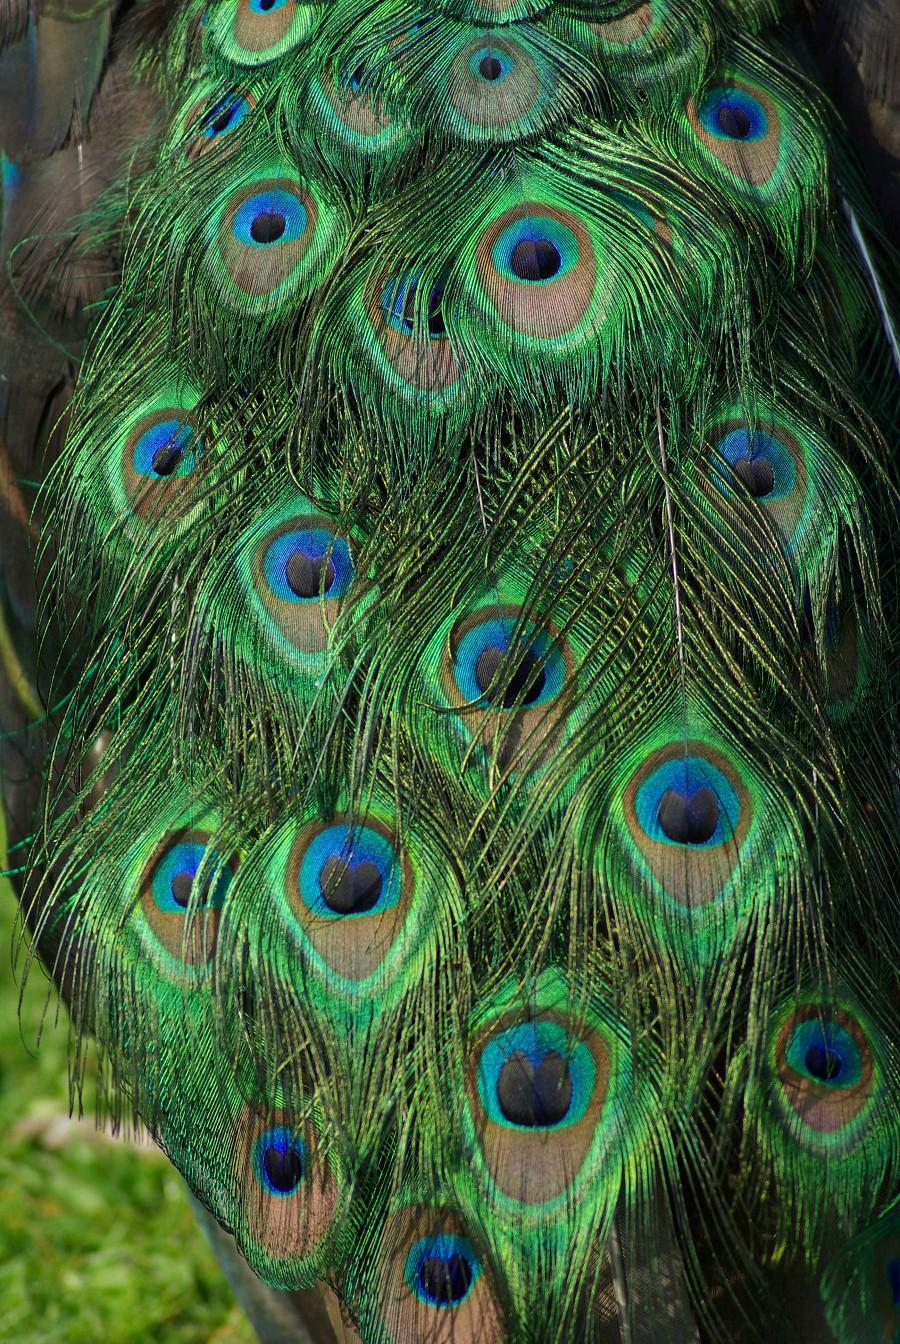 Peacock Plumage #1